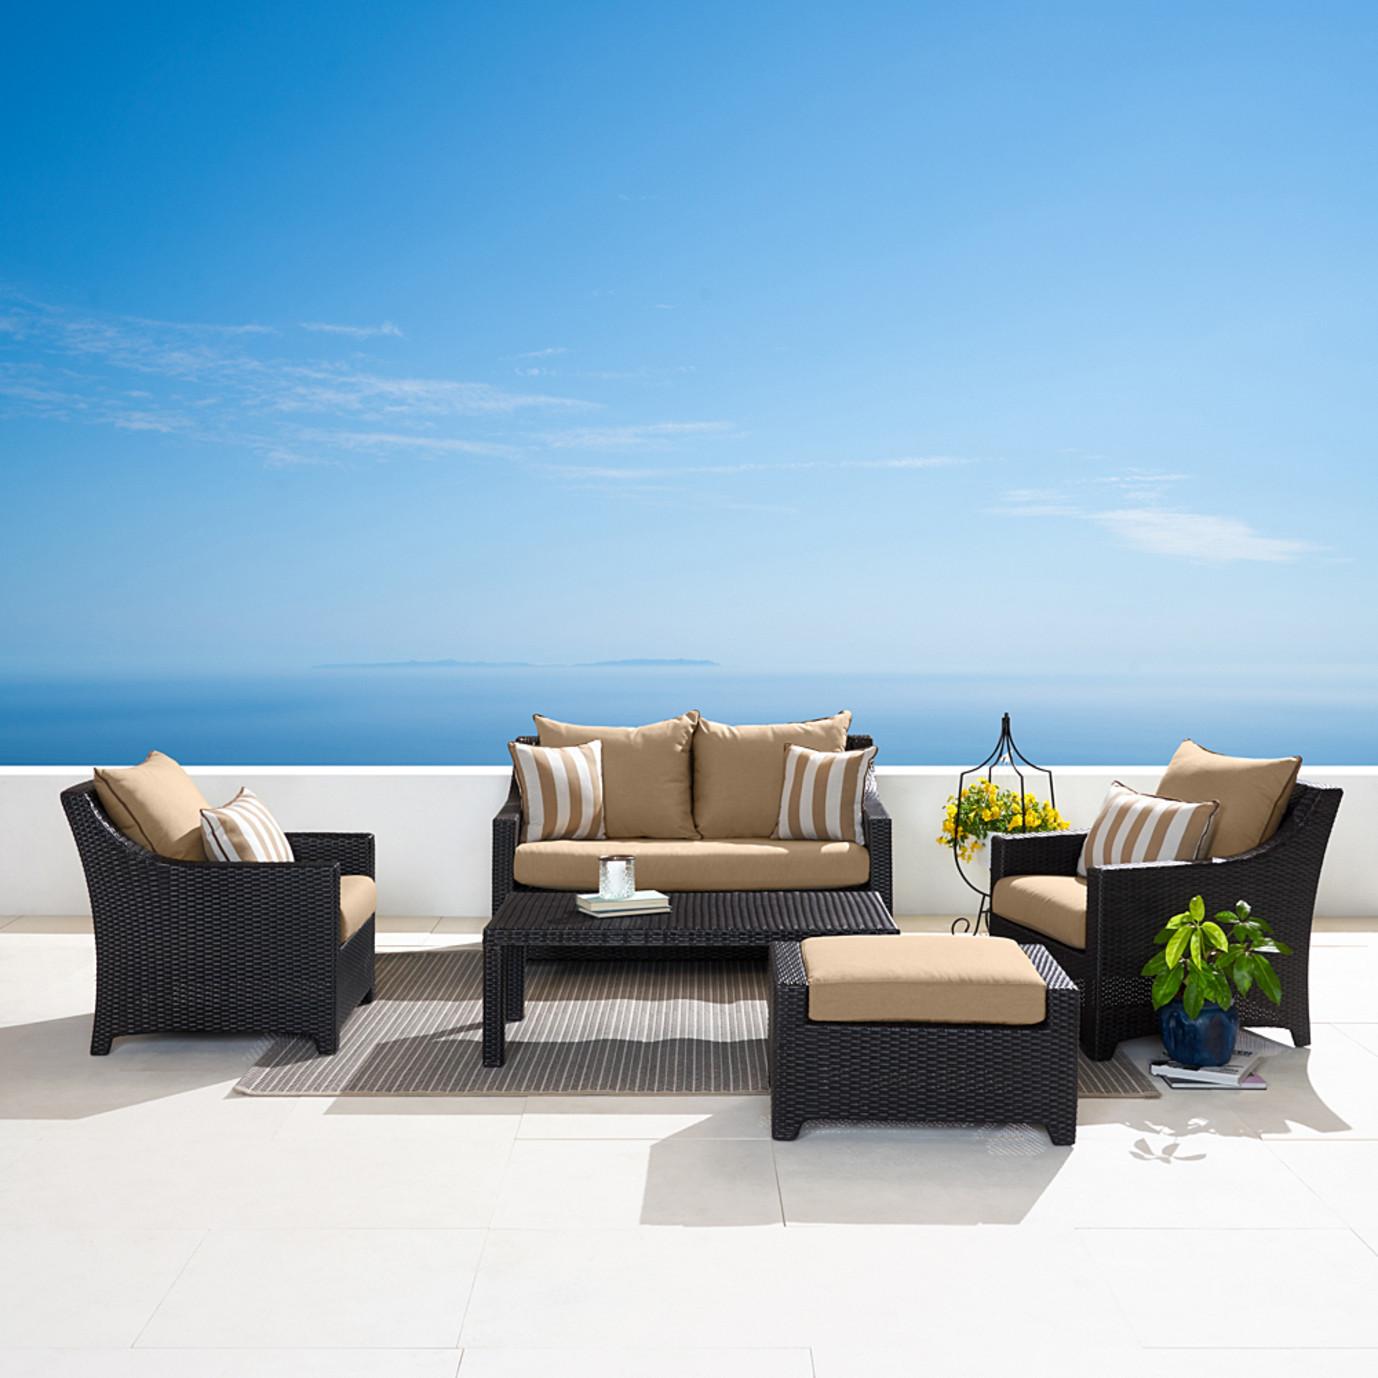 Deco™ 5 Piece Love & Club Seating Set - Maxim Beige